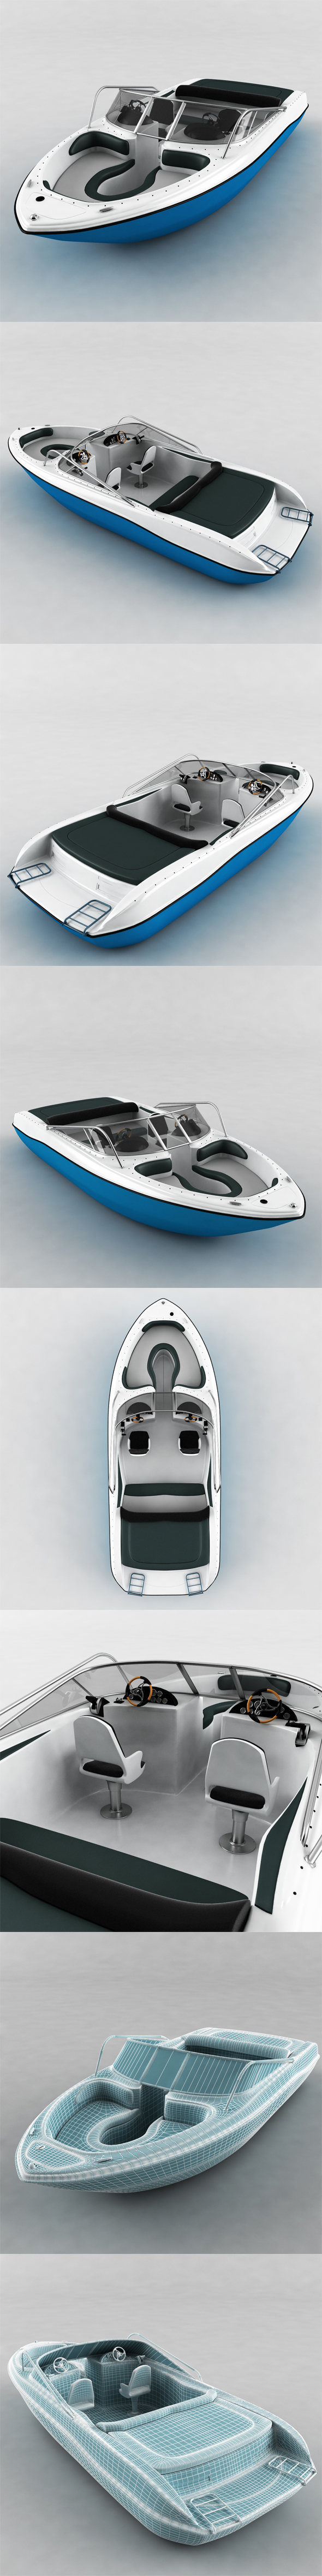 Motor Boat - 3DOcean Item for Sale